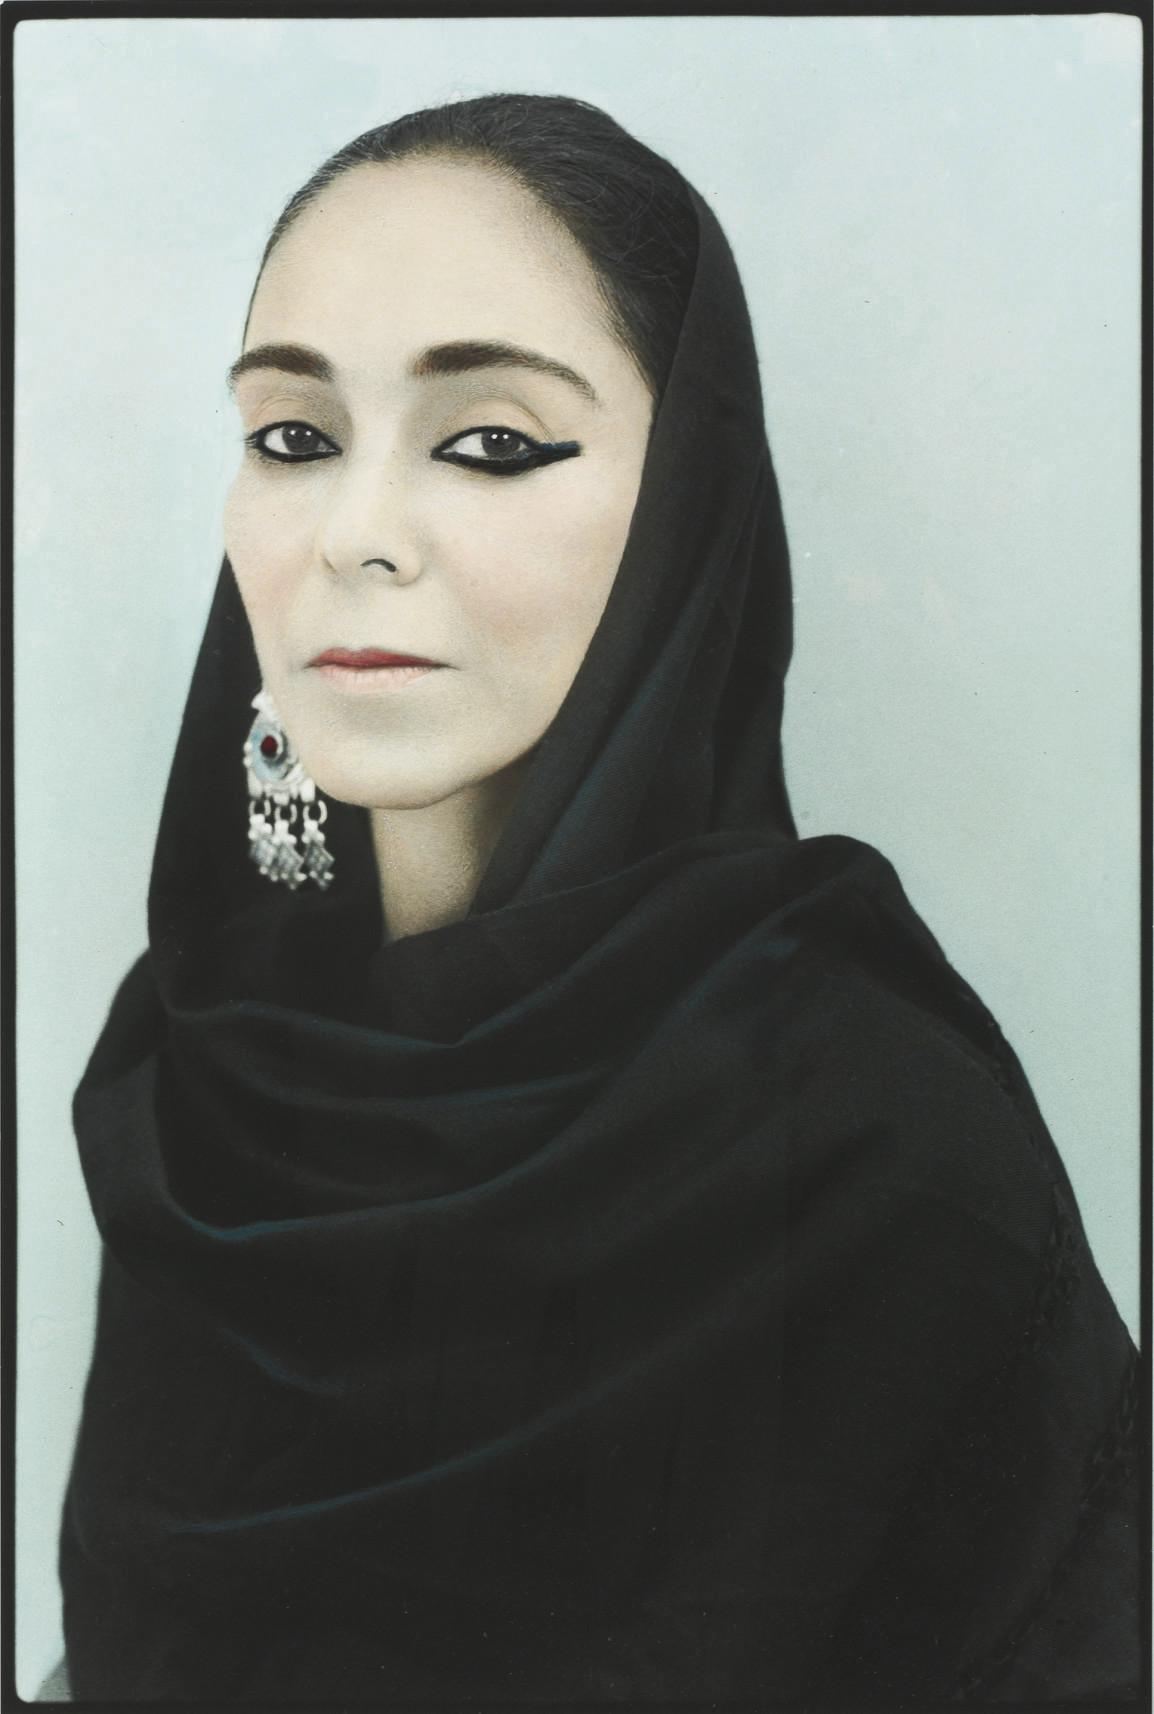 Youssef Nabil (b. 1972)